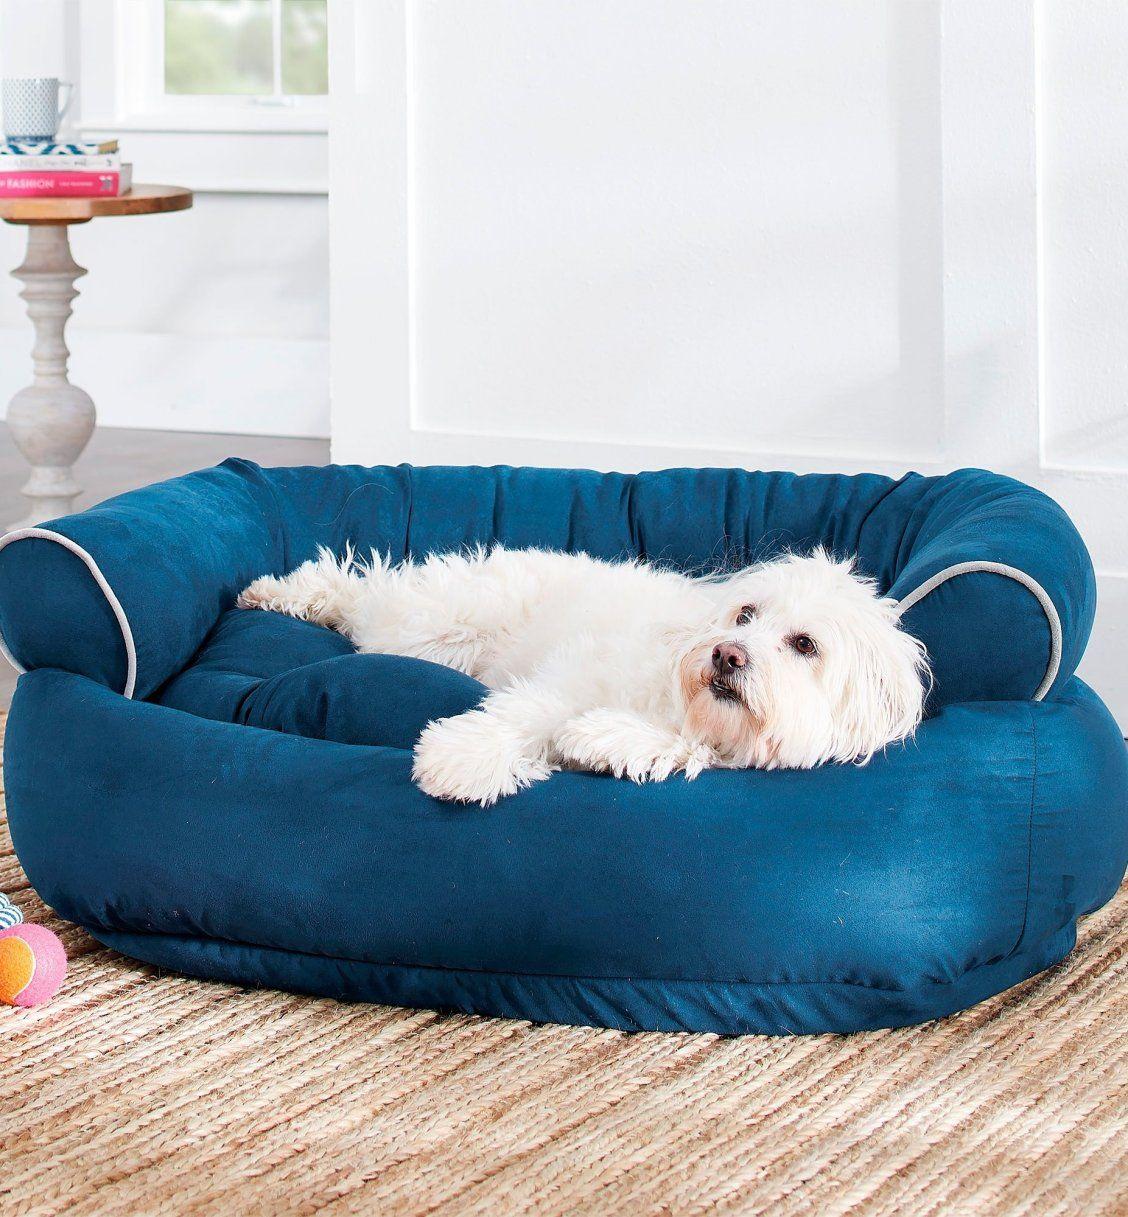 Sofa Dog Bed Grandin Road Dog Sofa Bed Dog Bed Clean Sofa